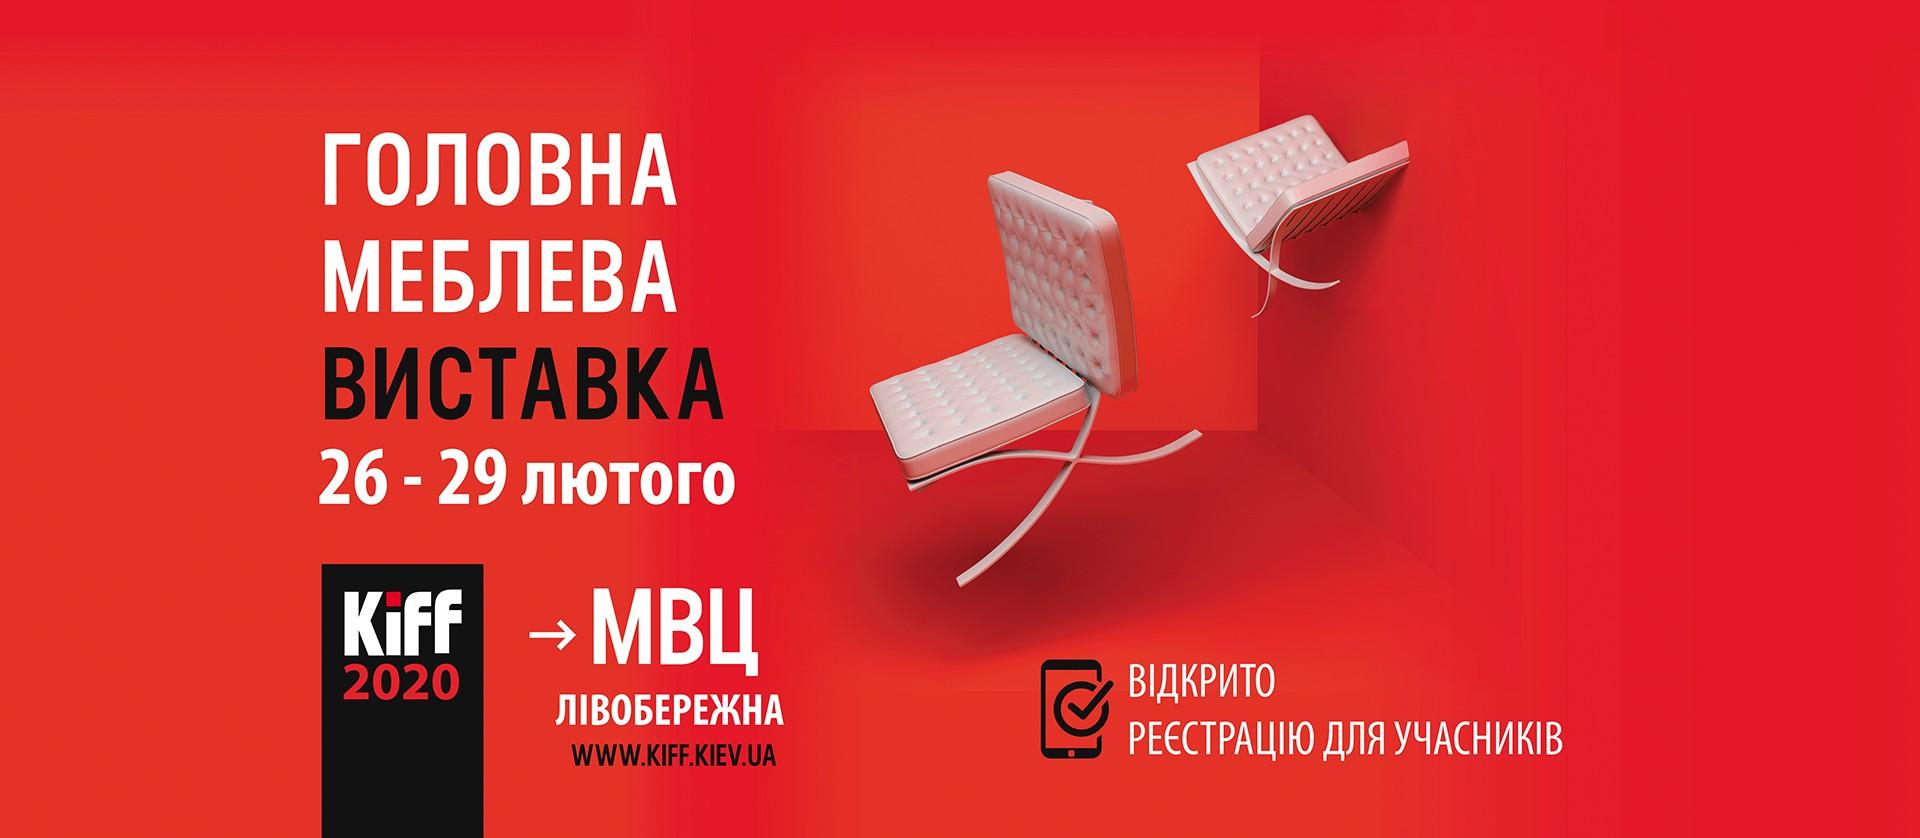 kiff 1375 600 ukr 1 - Головна